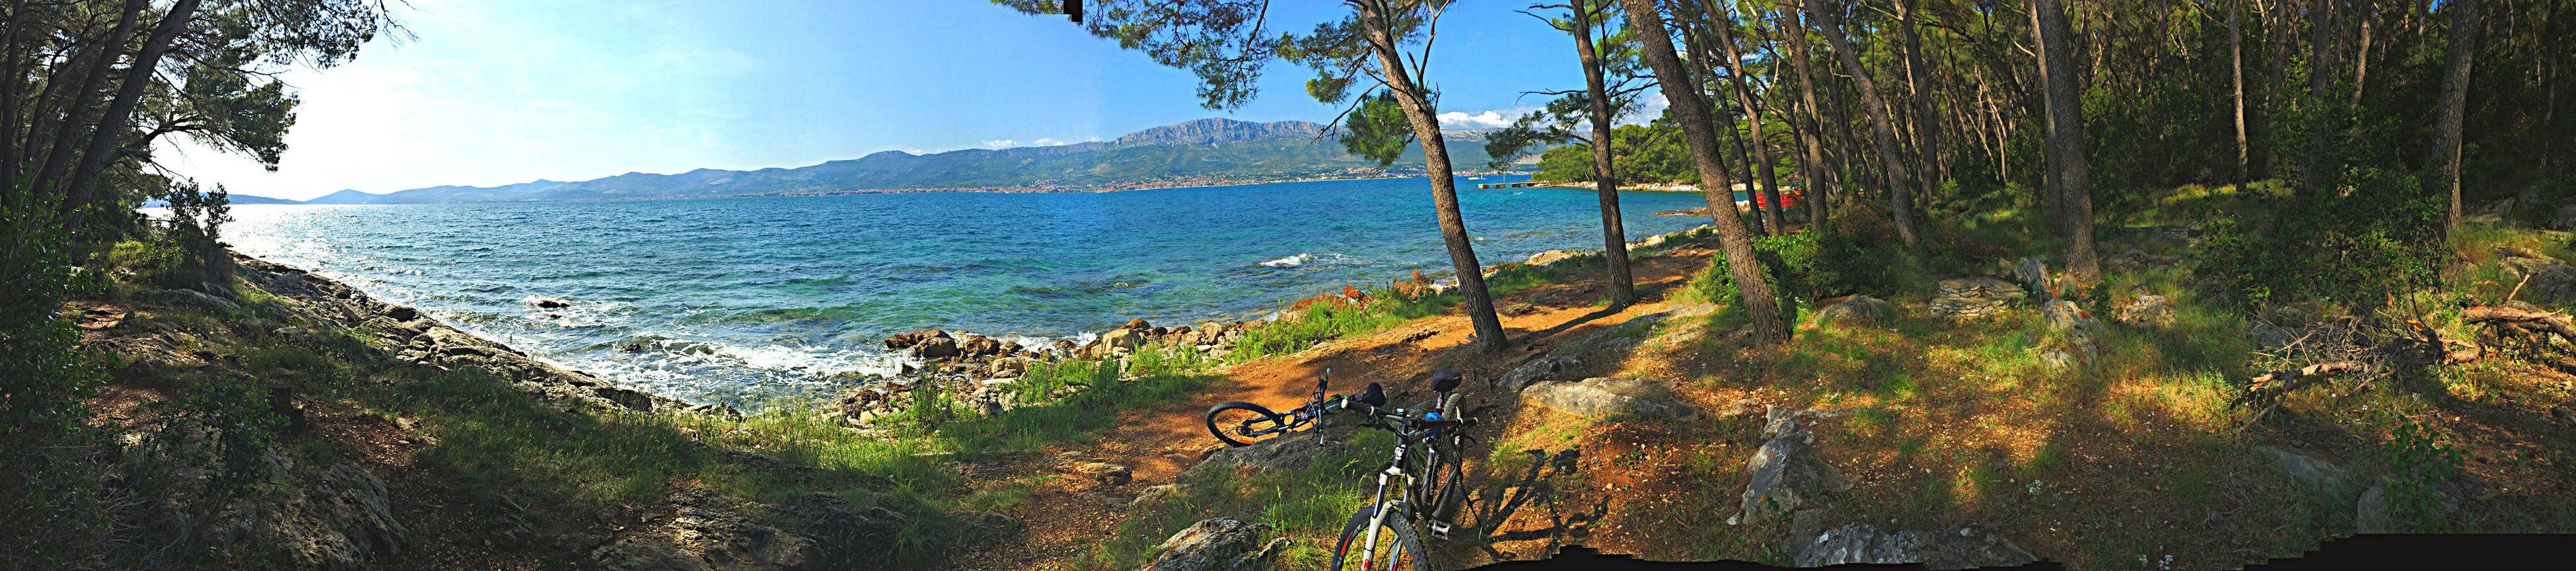 water, tranquil scene, tranquility, sea, scenics, beauty in nature, mountain, beach, nature, sky, tree, shore, idyllic, coastline, non-urban scene, sunlight, day, horizon over water, sand, blue